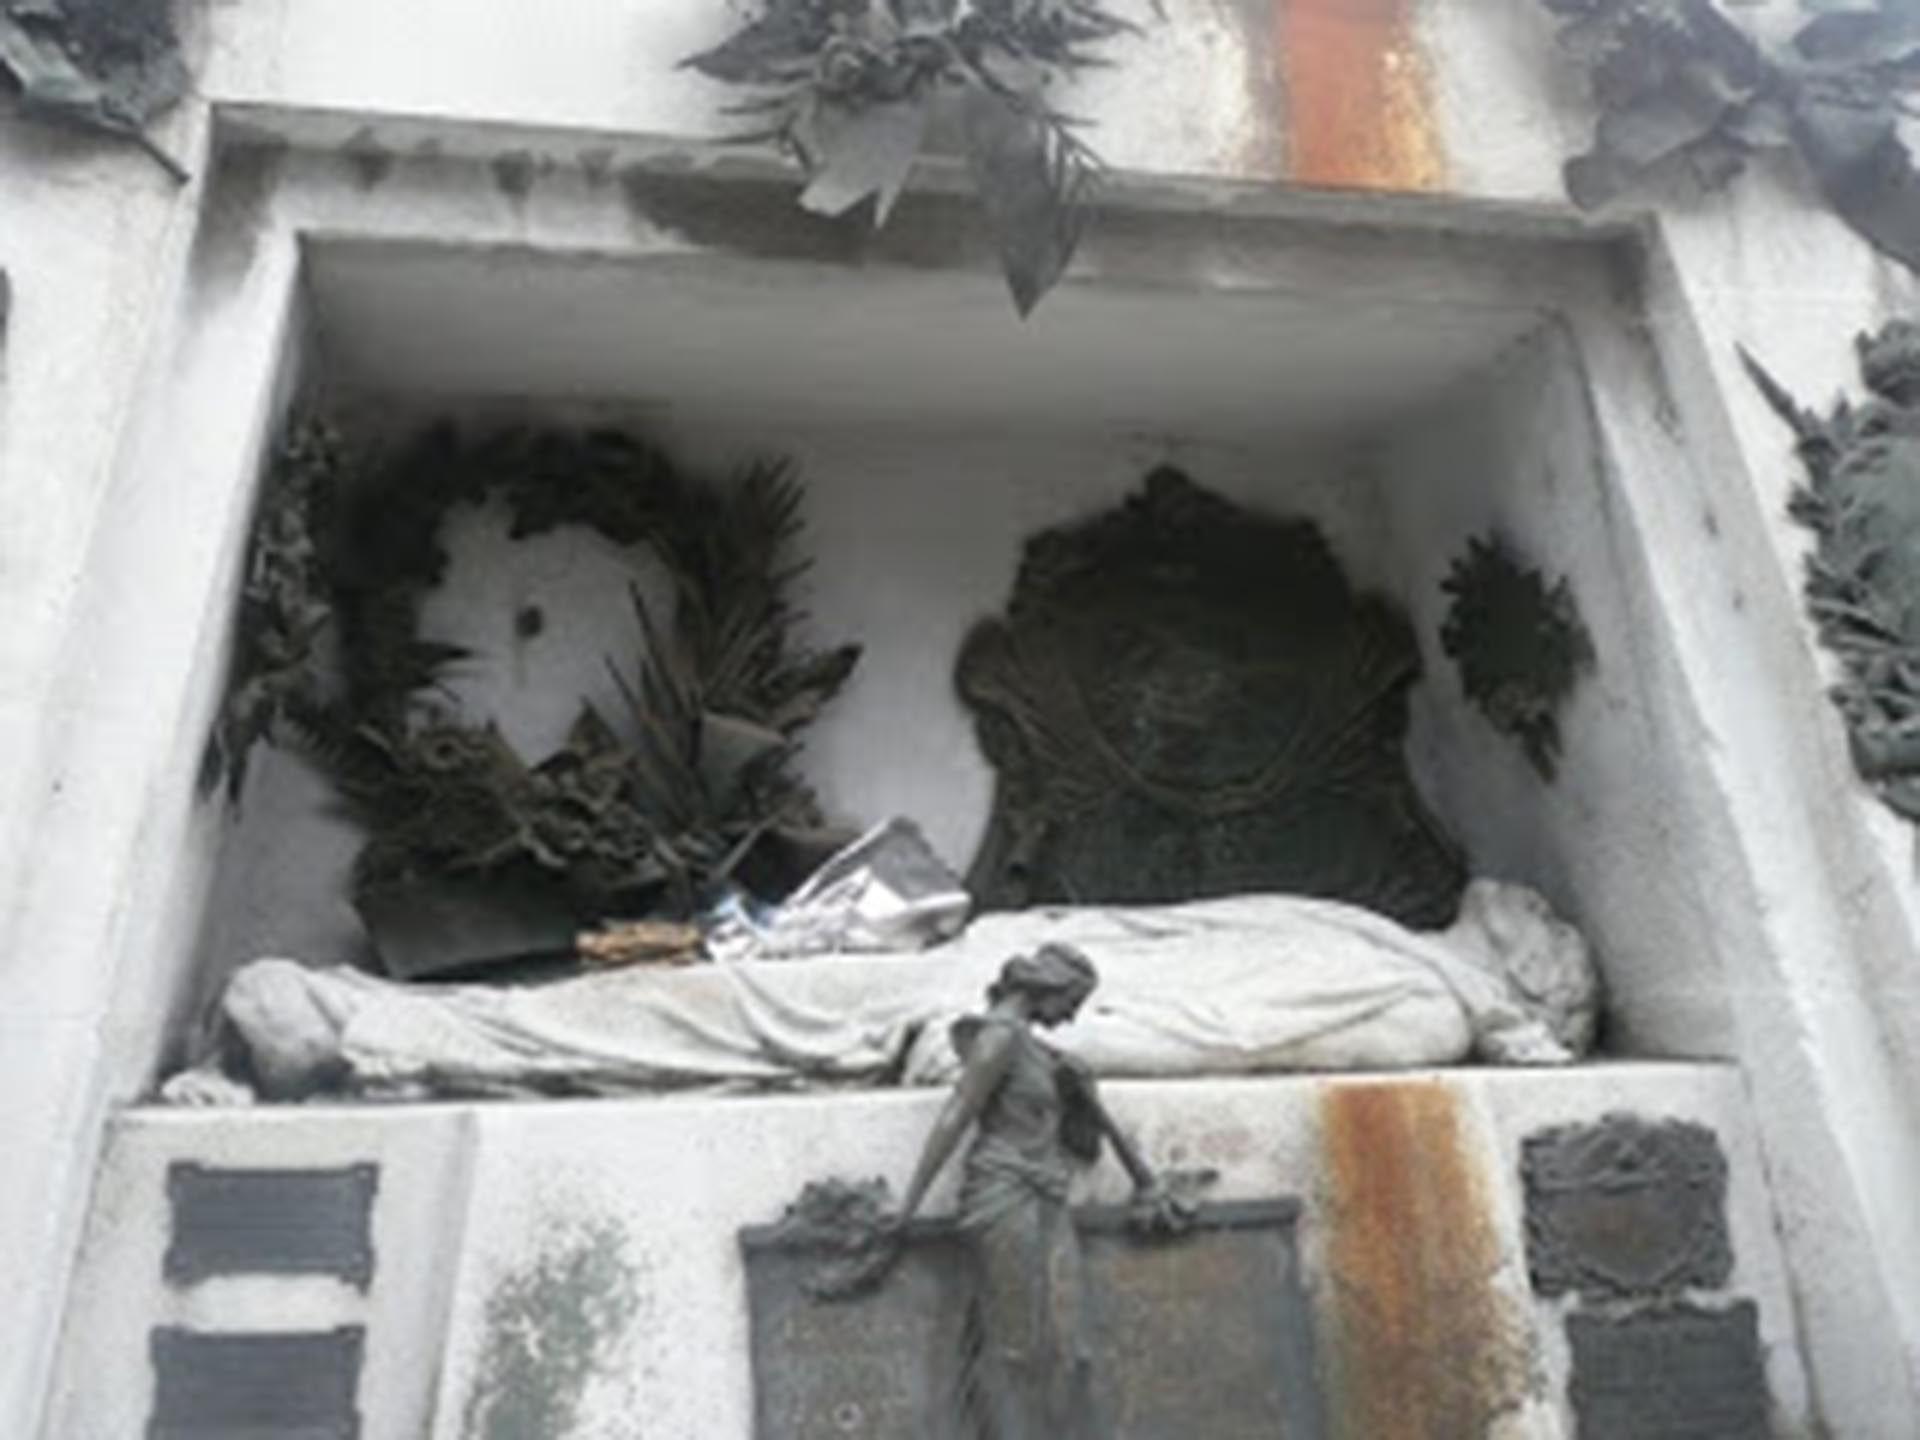 El mausoleo en donde está enterrado Ramón Falcón